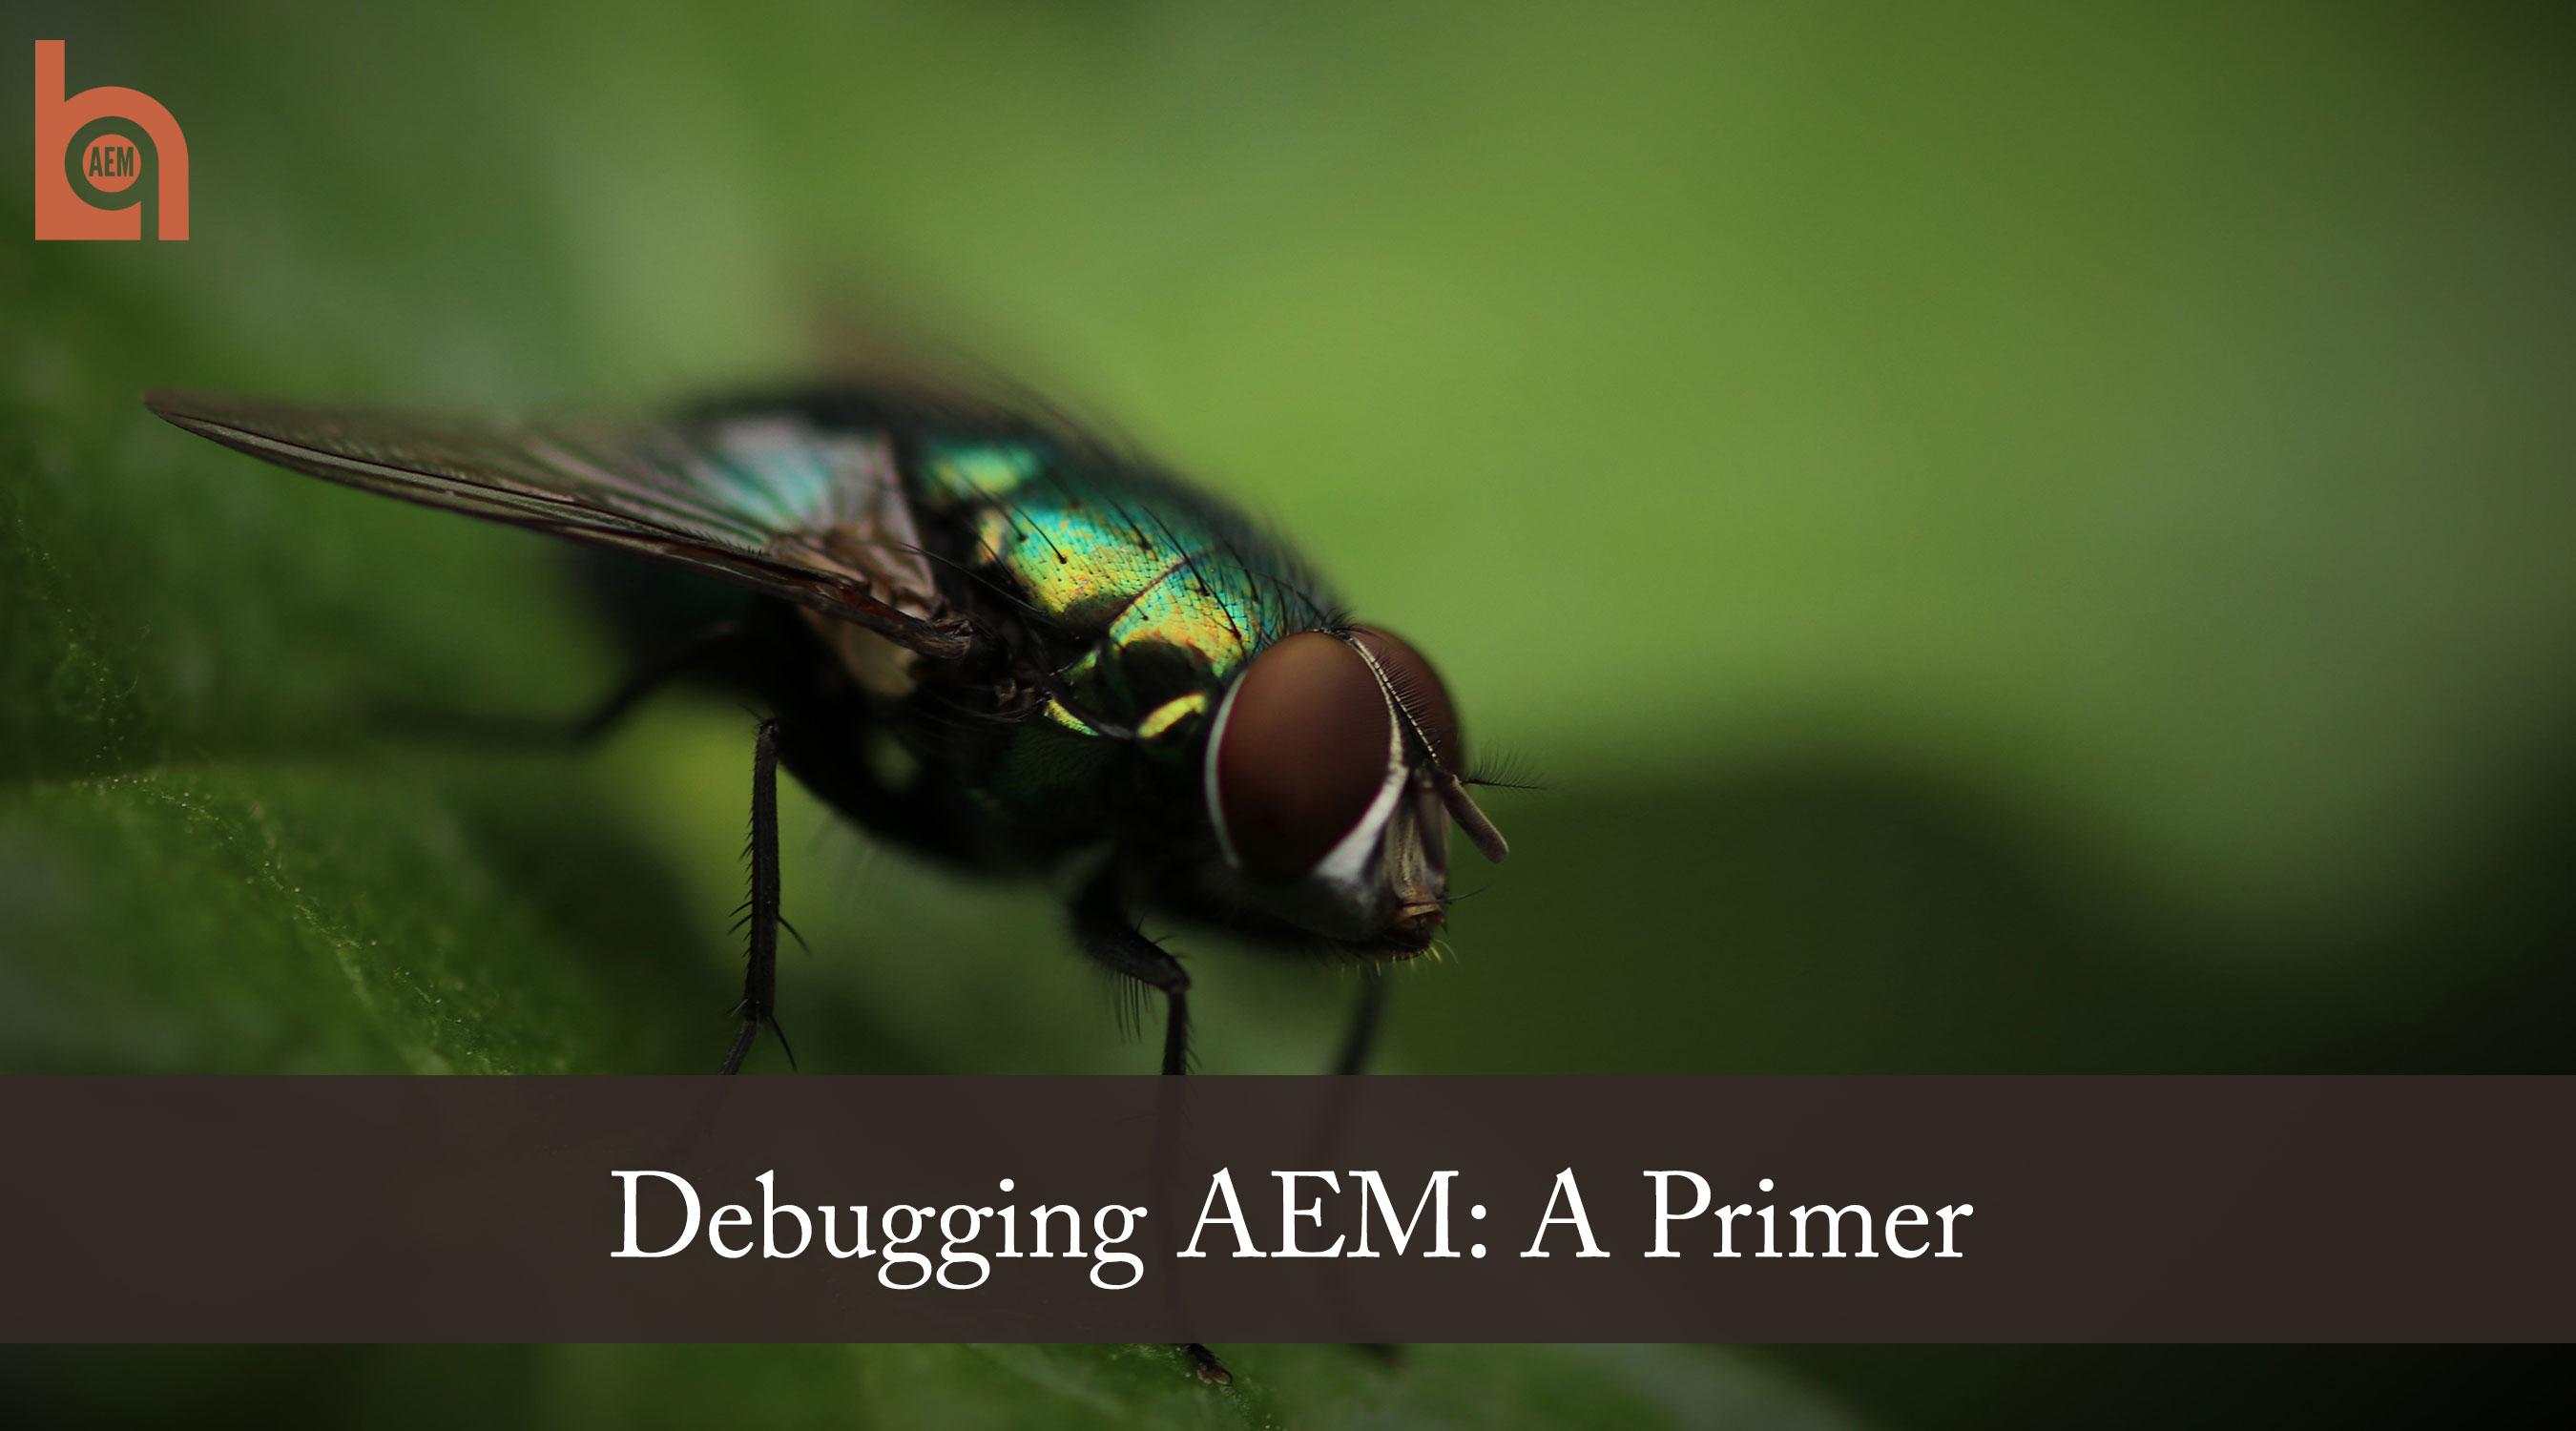 Debugging AEM: A Primer